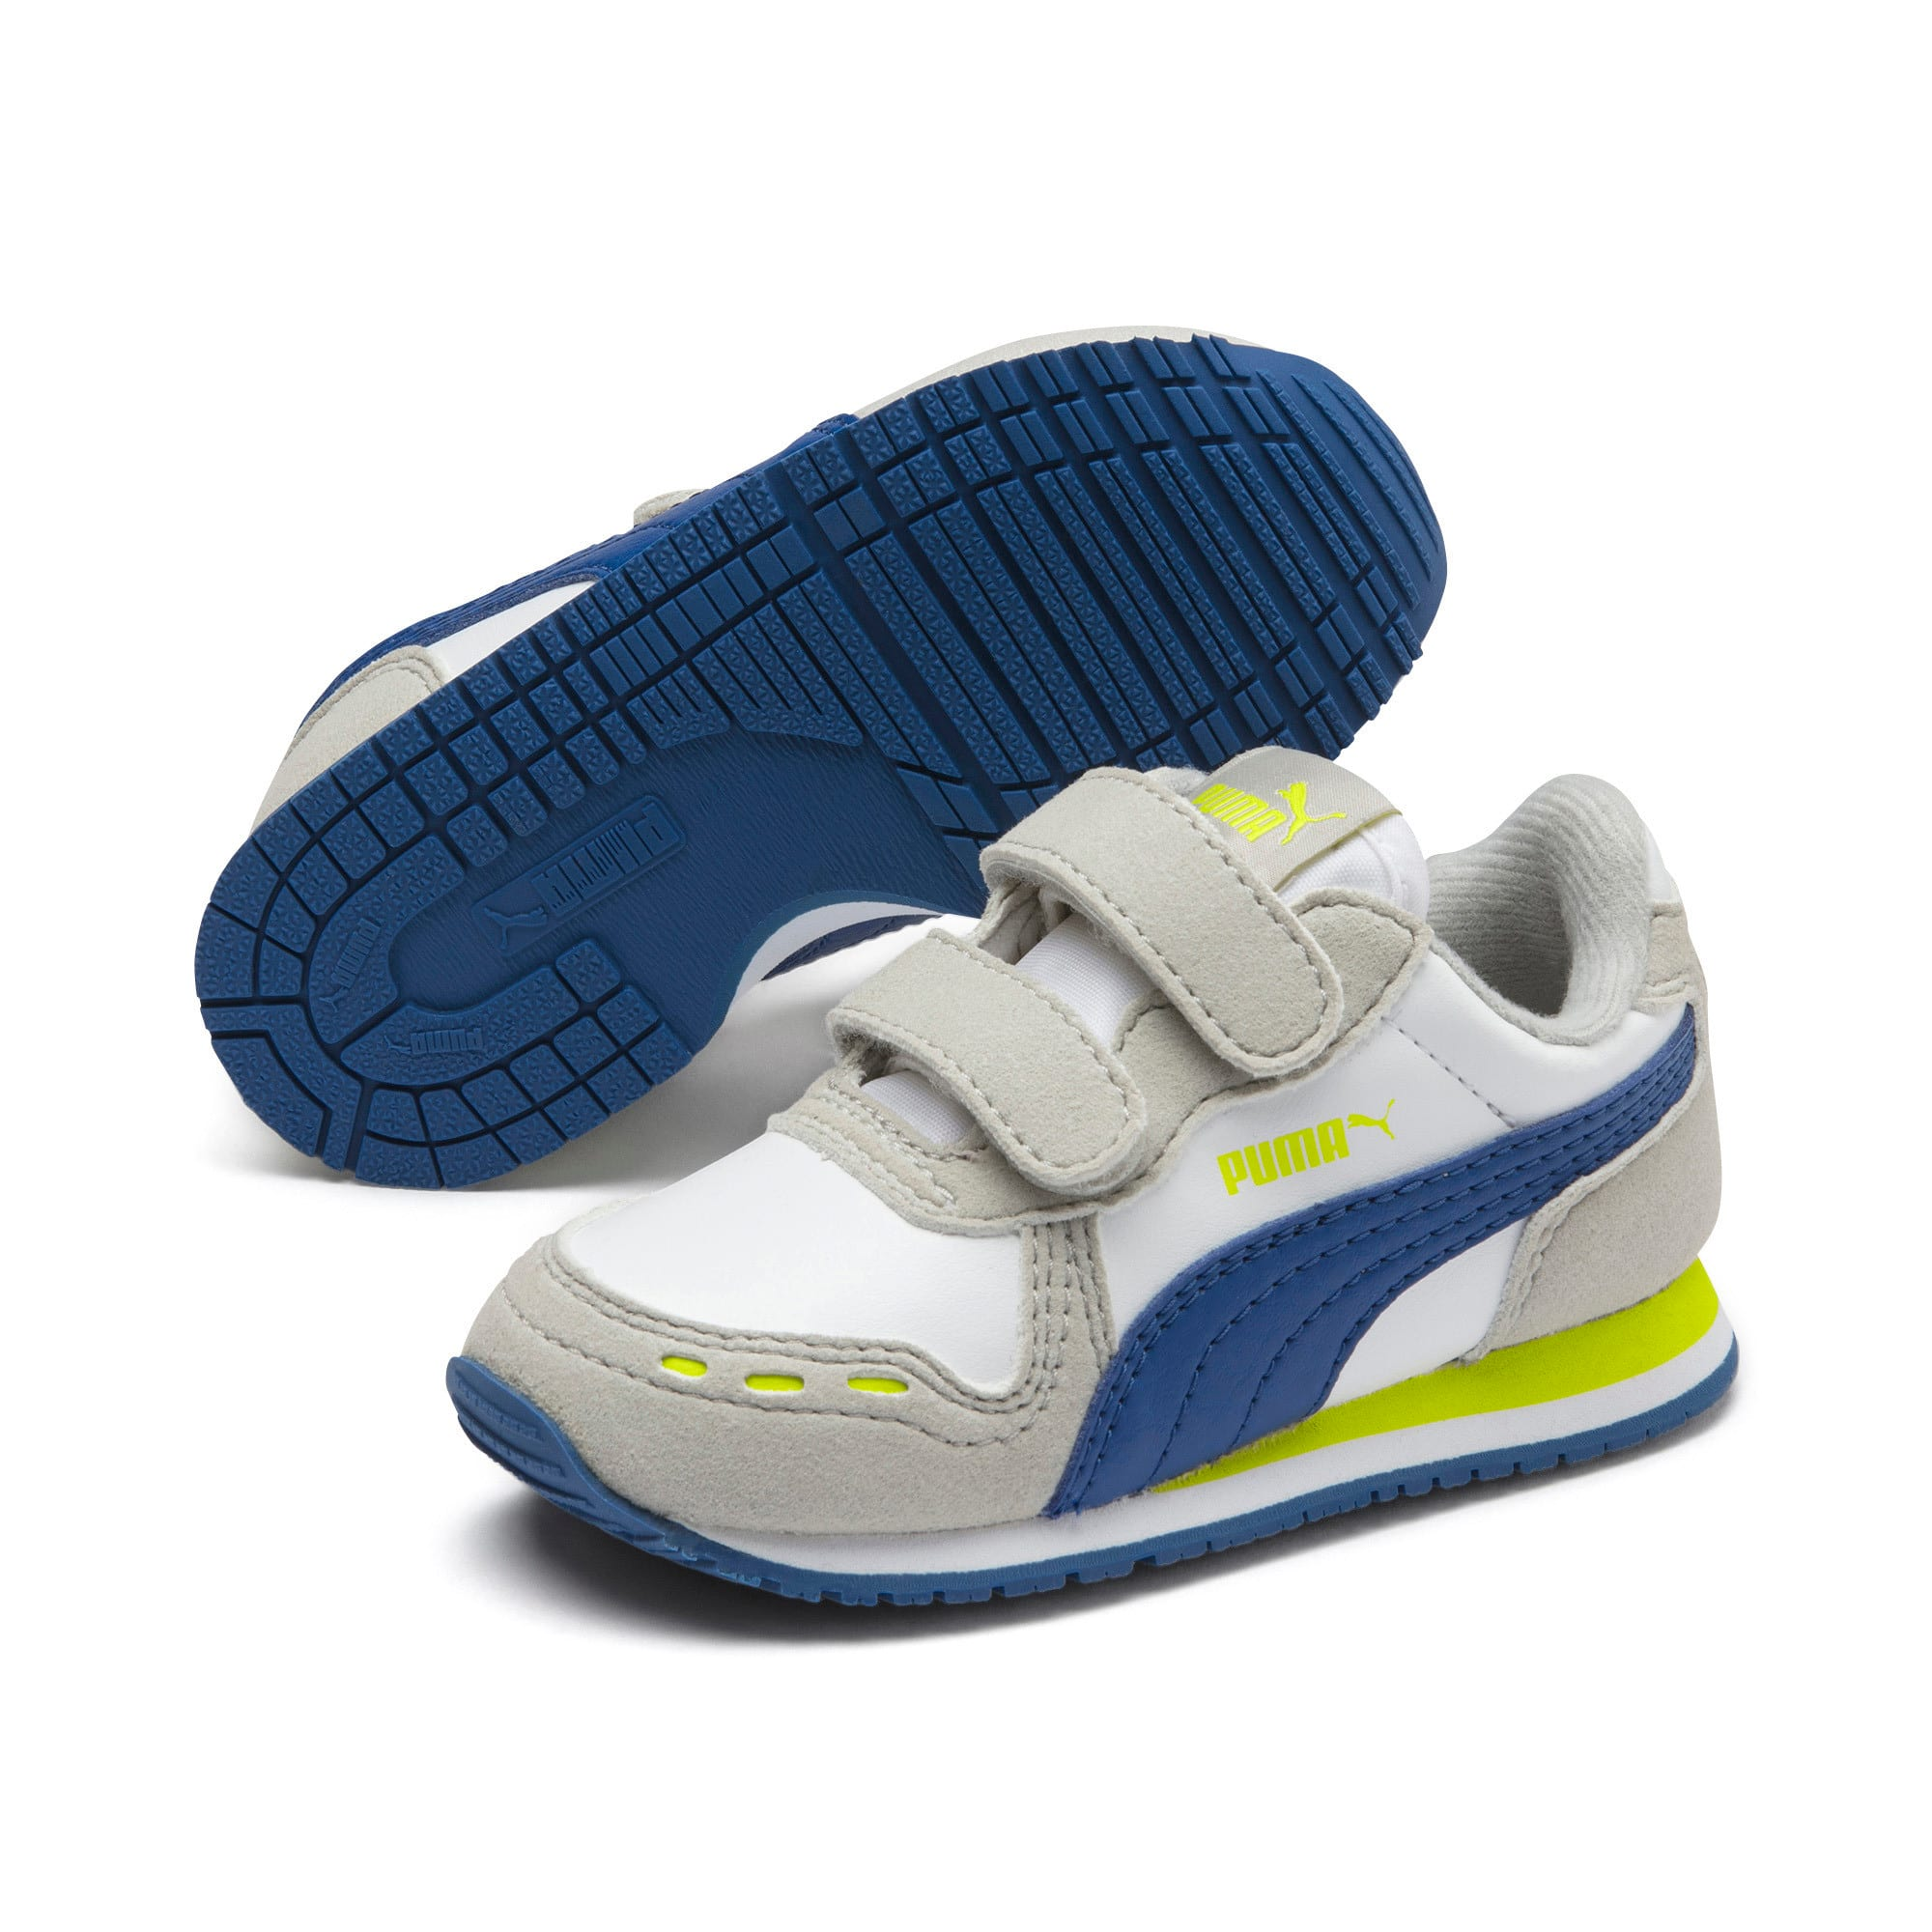 Thumbnail 2 of Cabana Racer SL Toddler Shoes, Puma White-Galaxy Blue, medium